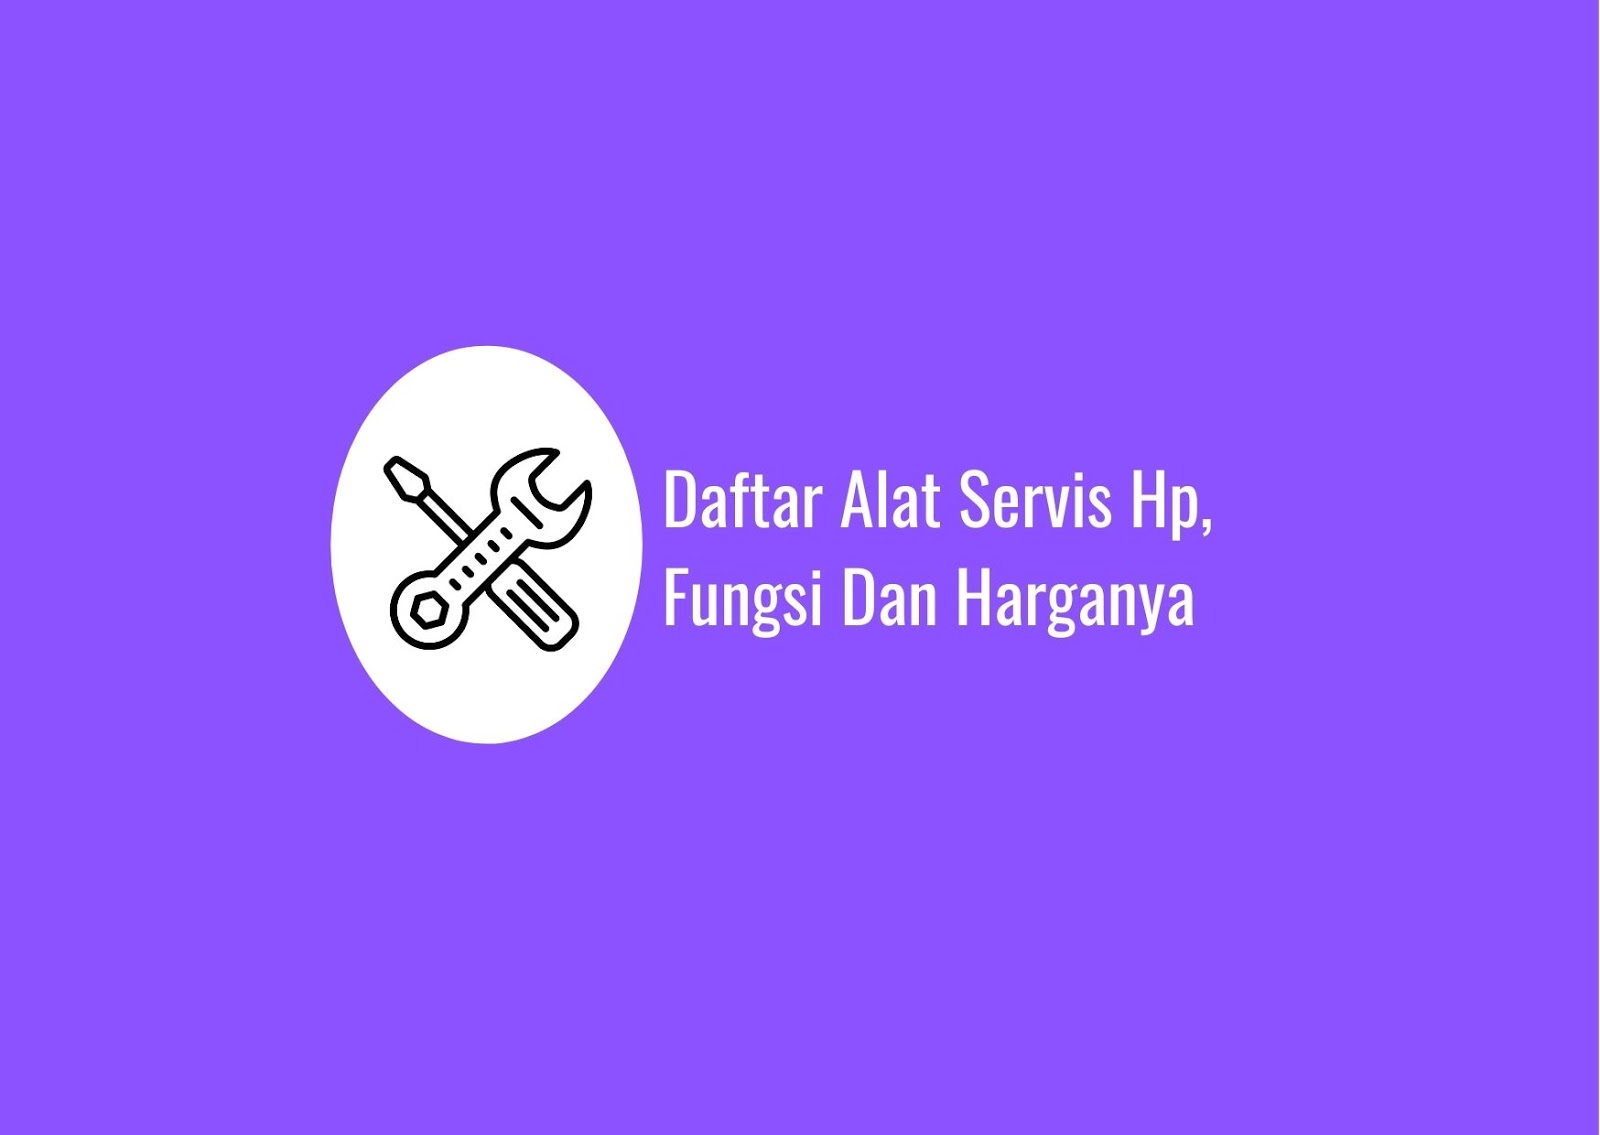 Daftar Alat Servis Hp, Fungsi Dan Harganya